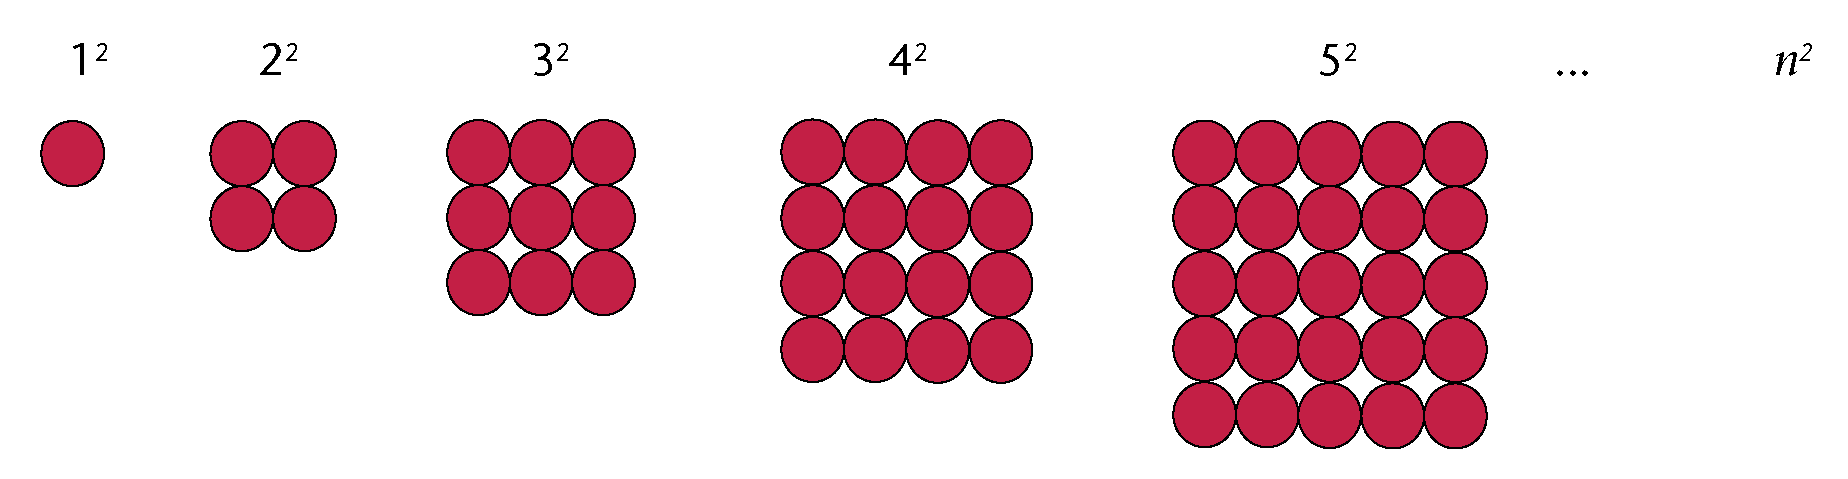 hight resolution of Gr8 Mathematics